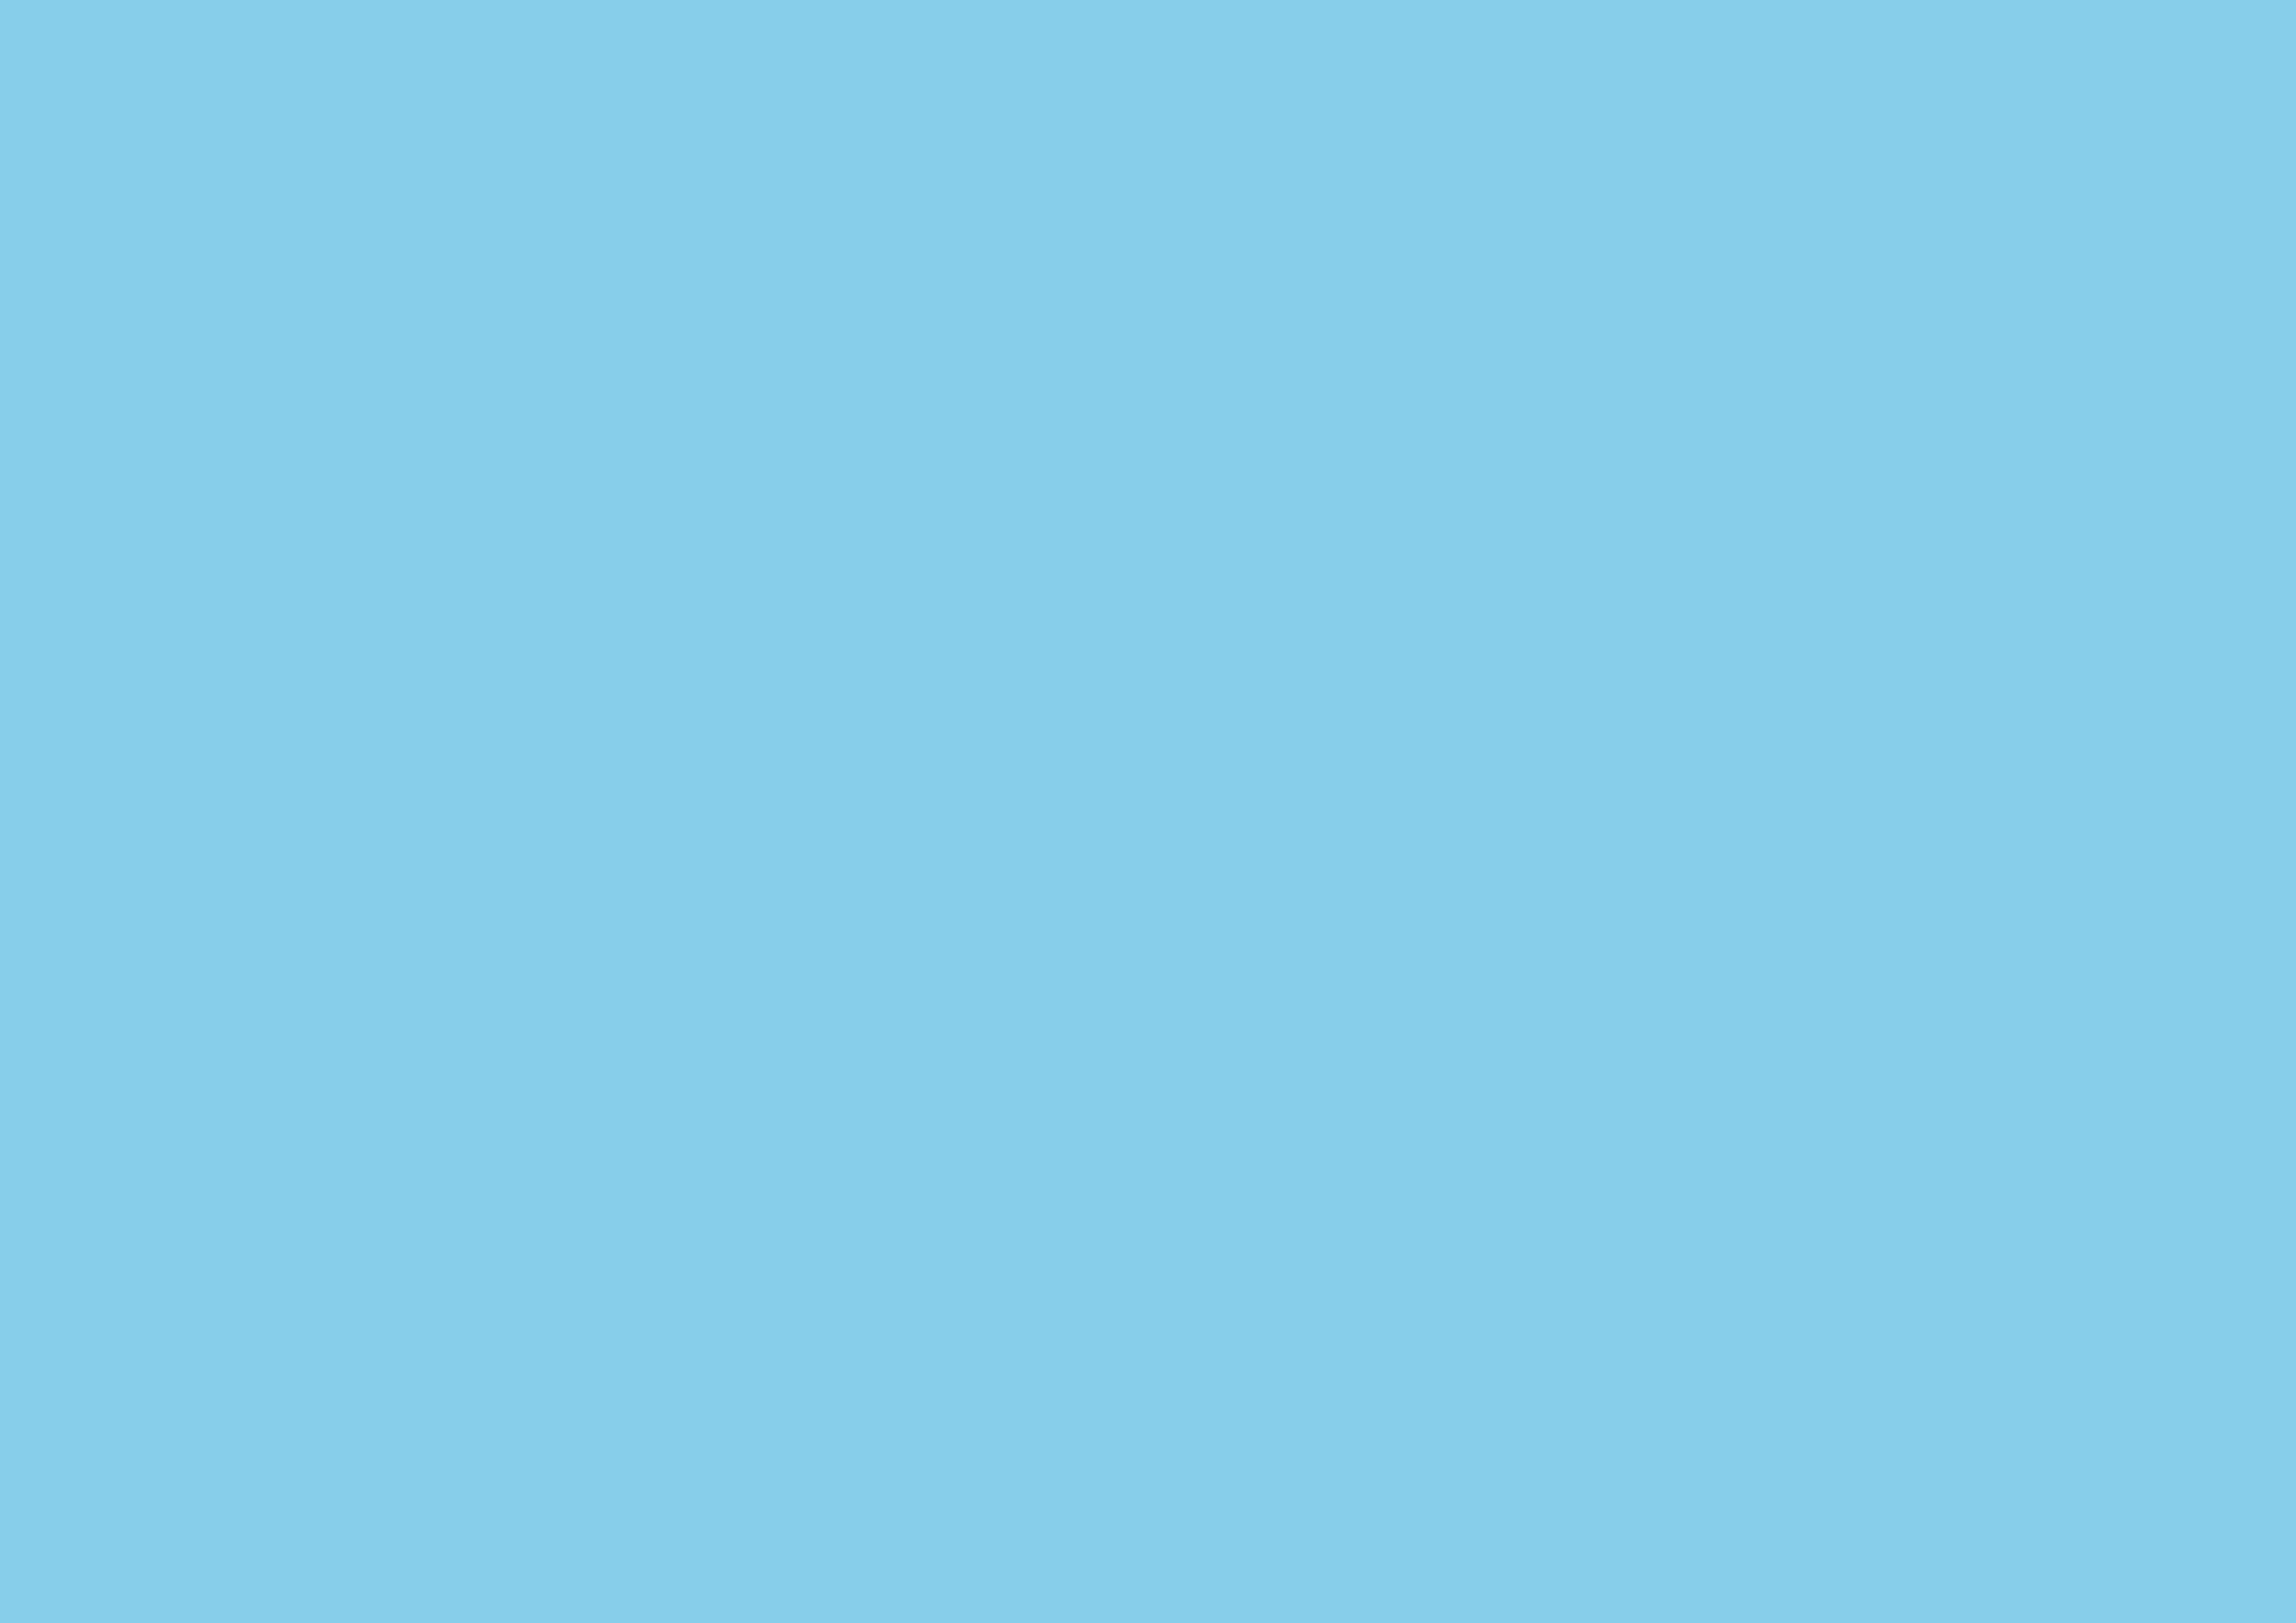 3508x2480 Sky Blue Solid Color Background